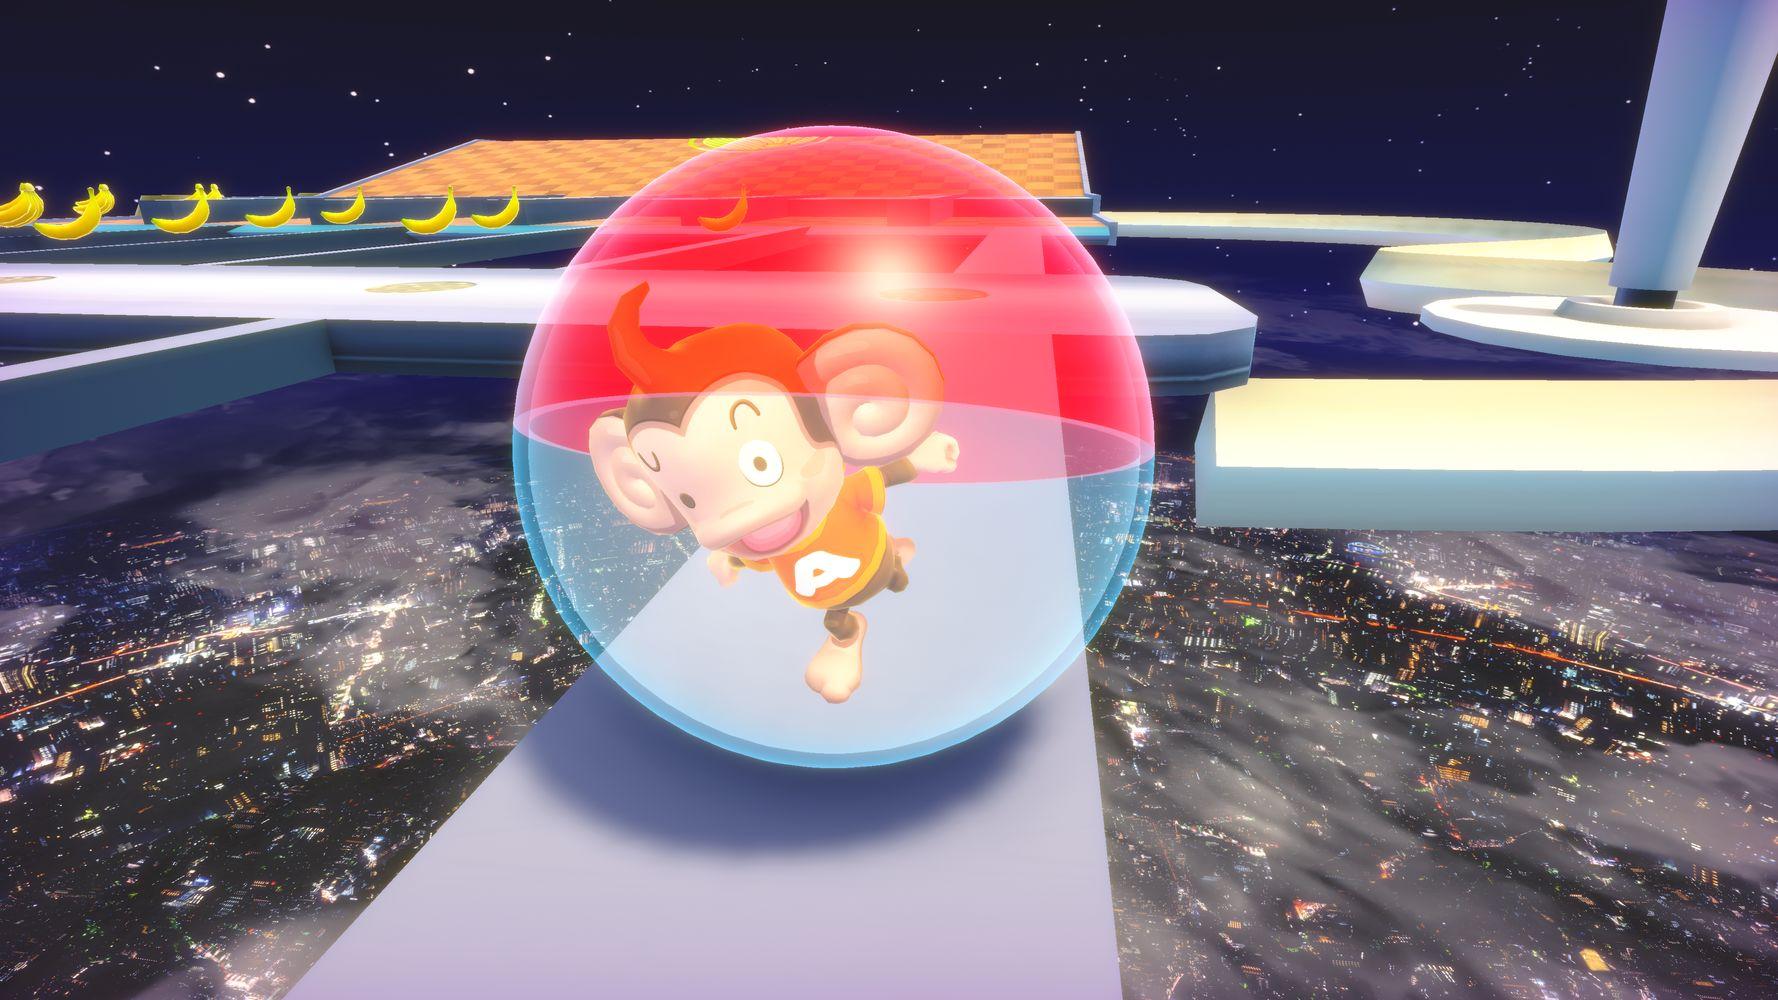 Super Monkey Ball: Banana Mania